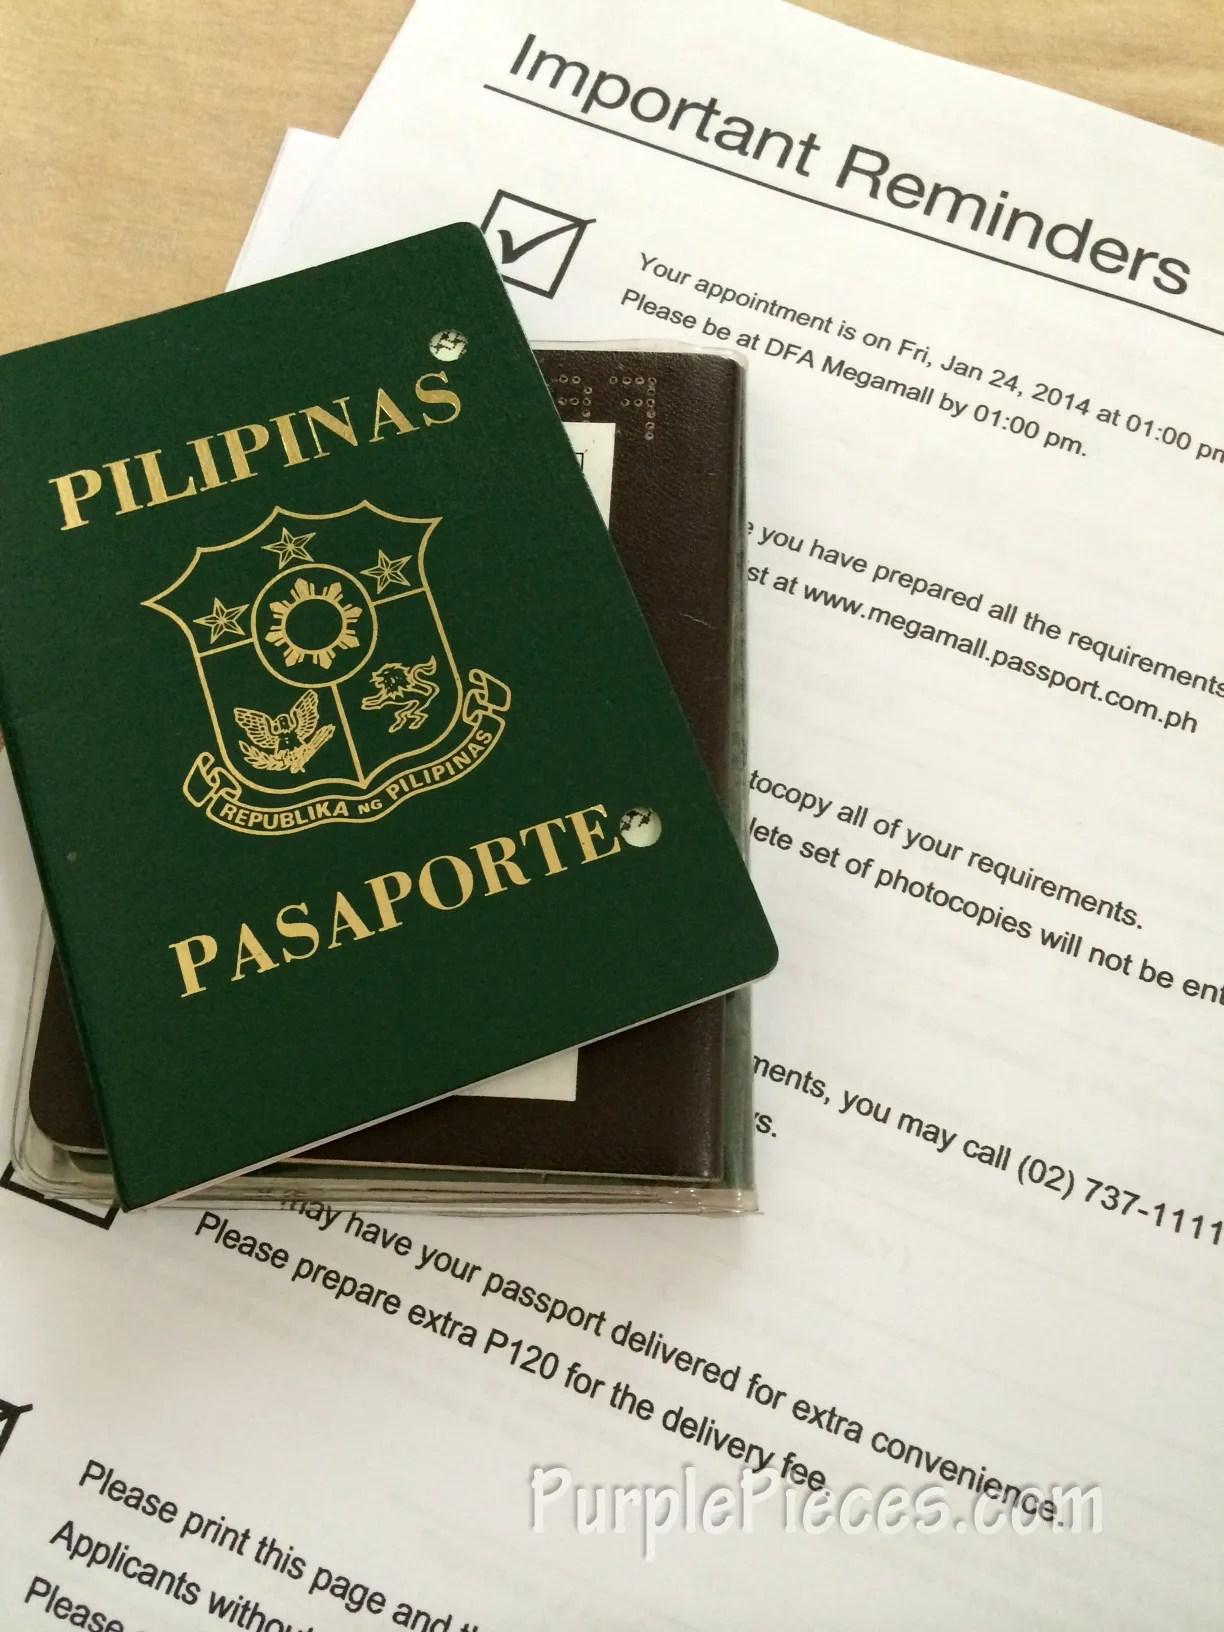 passport-renewal-sm-megamall-dfa